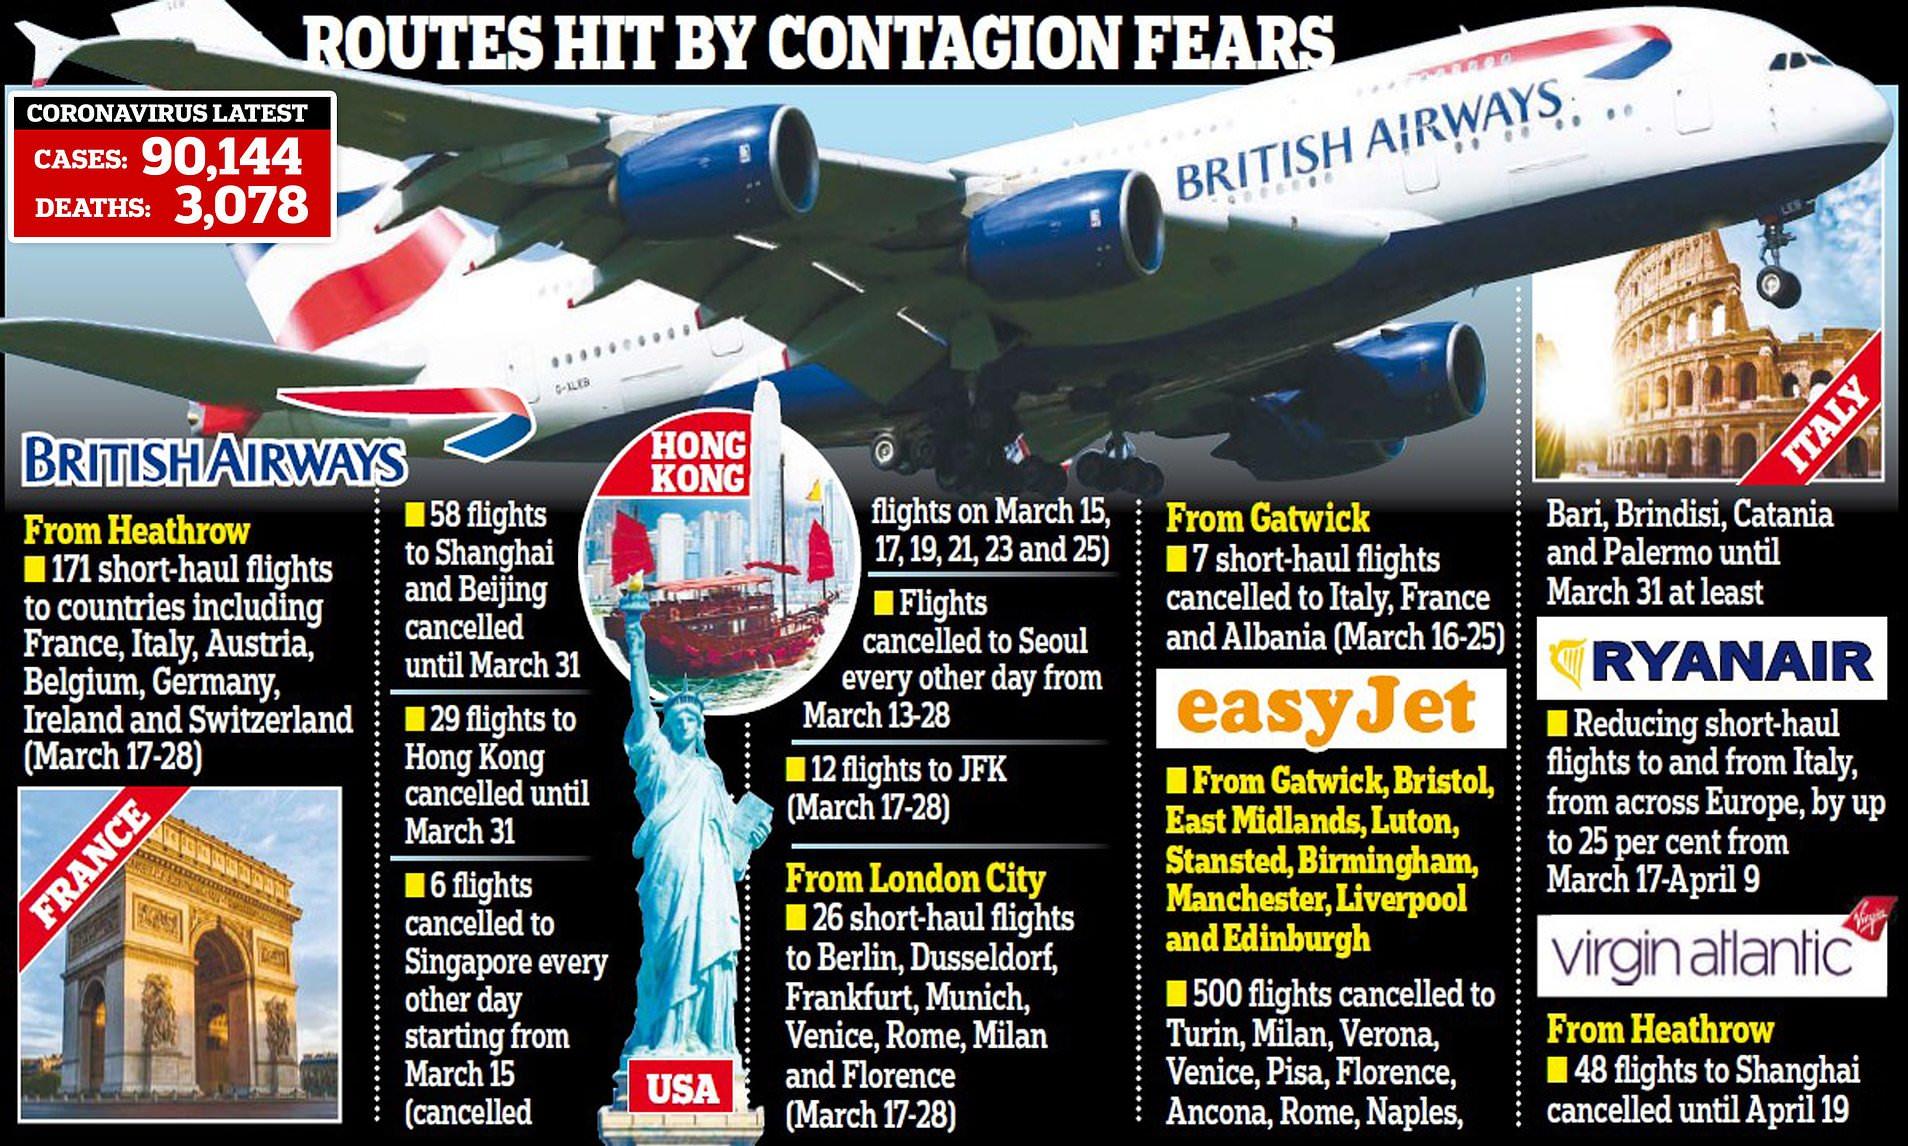 BA cancels some transatlantic flights due to coronavirus | Daily ...